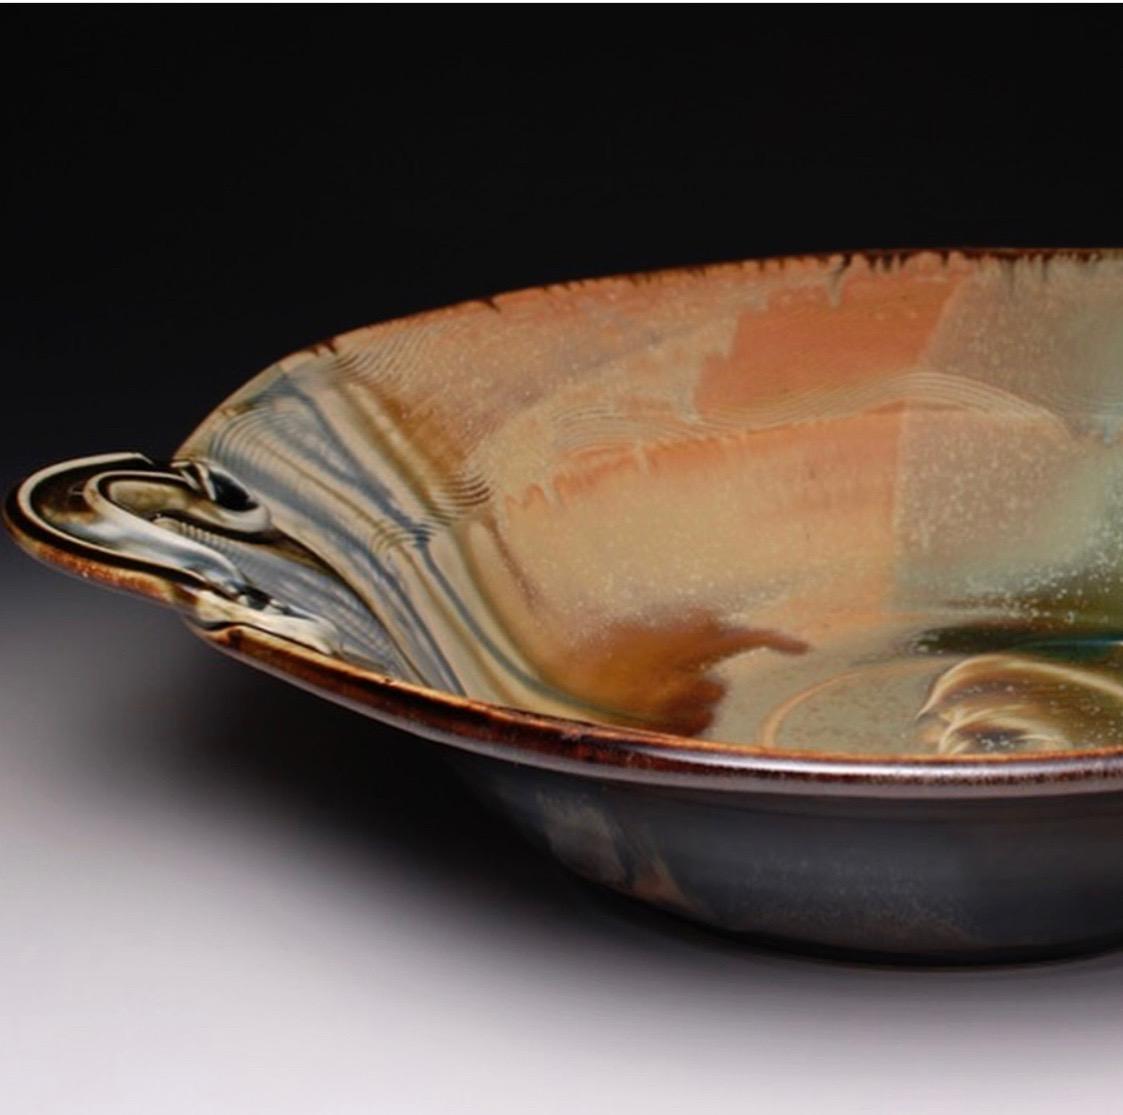 Ansel Beck Pottery